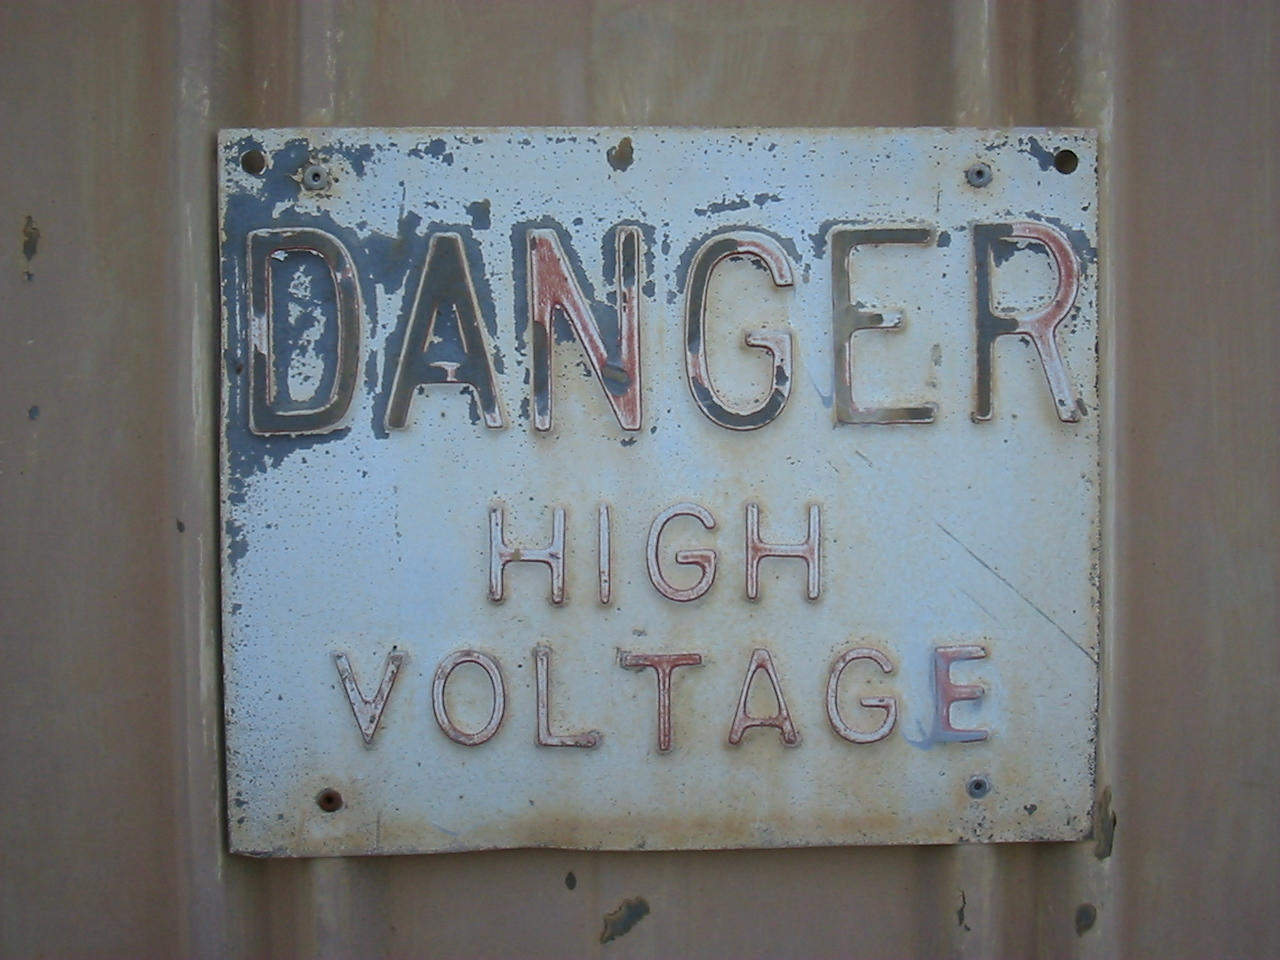 Danger High Voltage Sign - old by kayne-stock